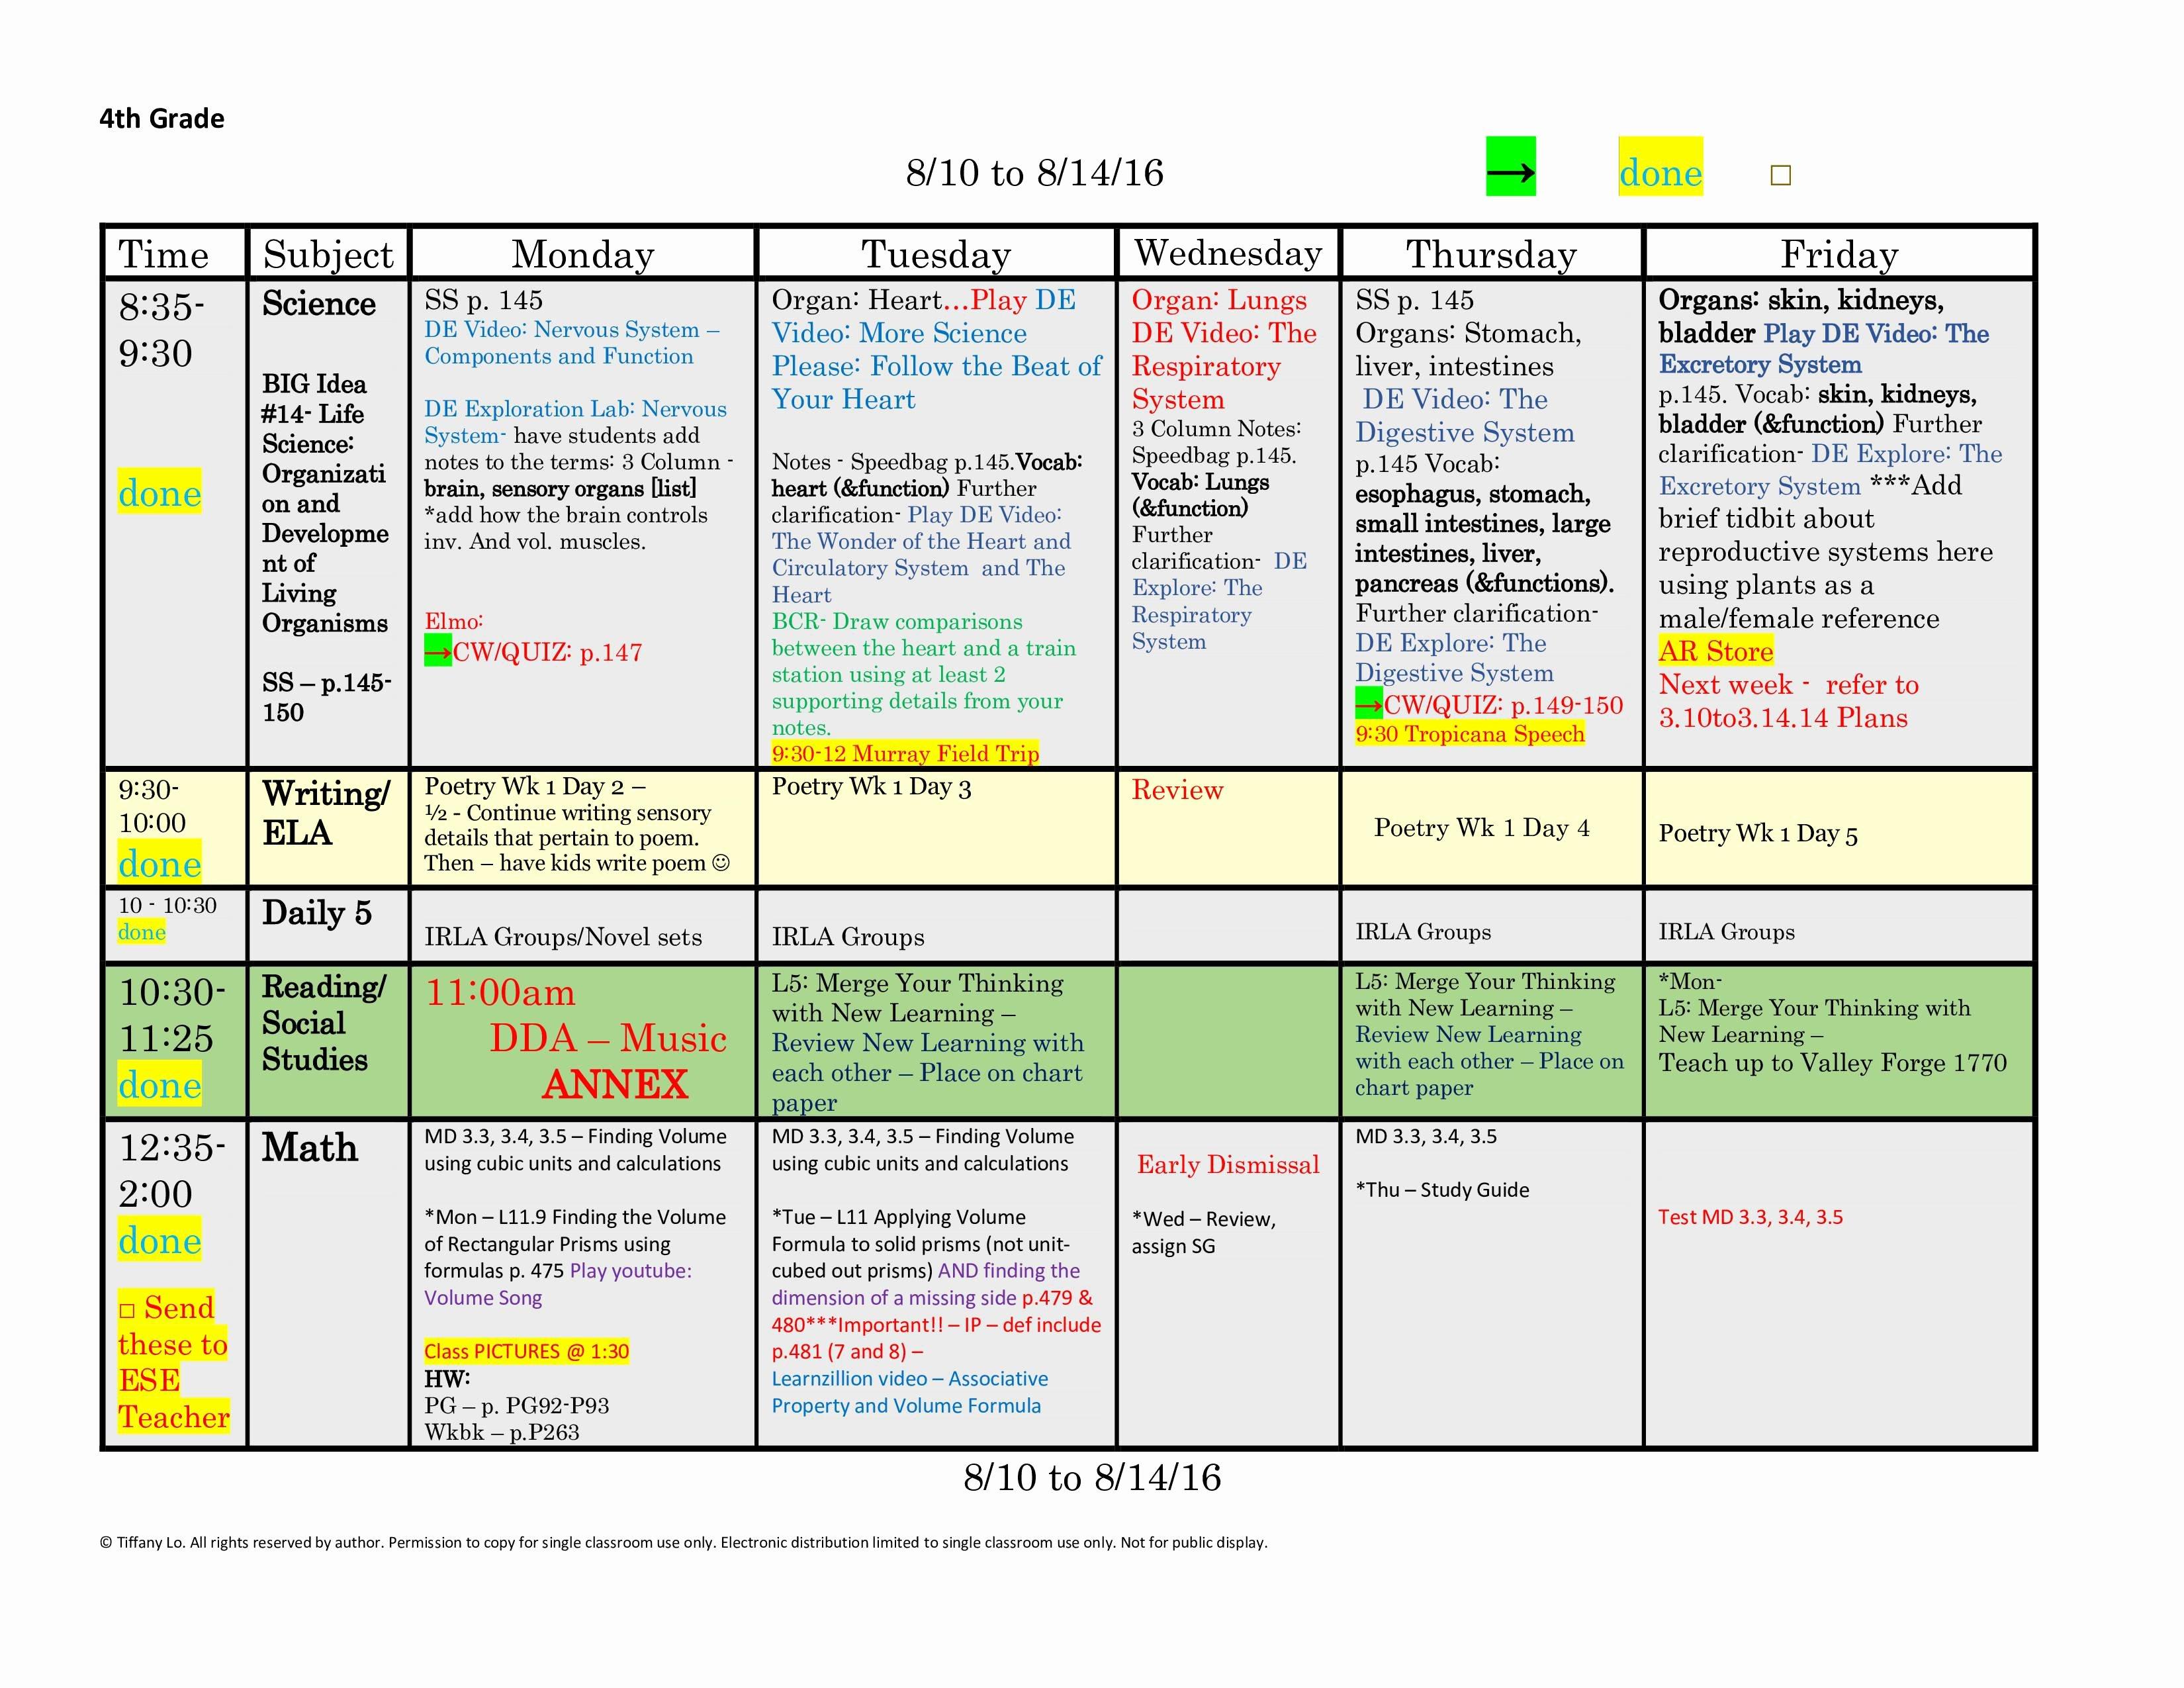 1st Grade Lesson Plan Template Fresh 4th Fourth Grade Lesson Plan Template E Week E Page